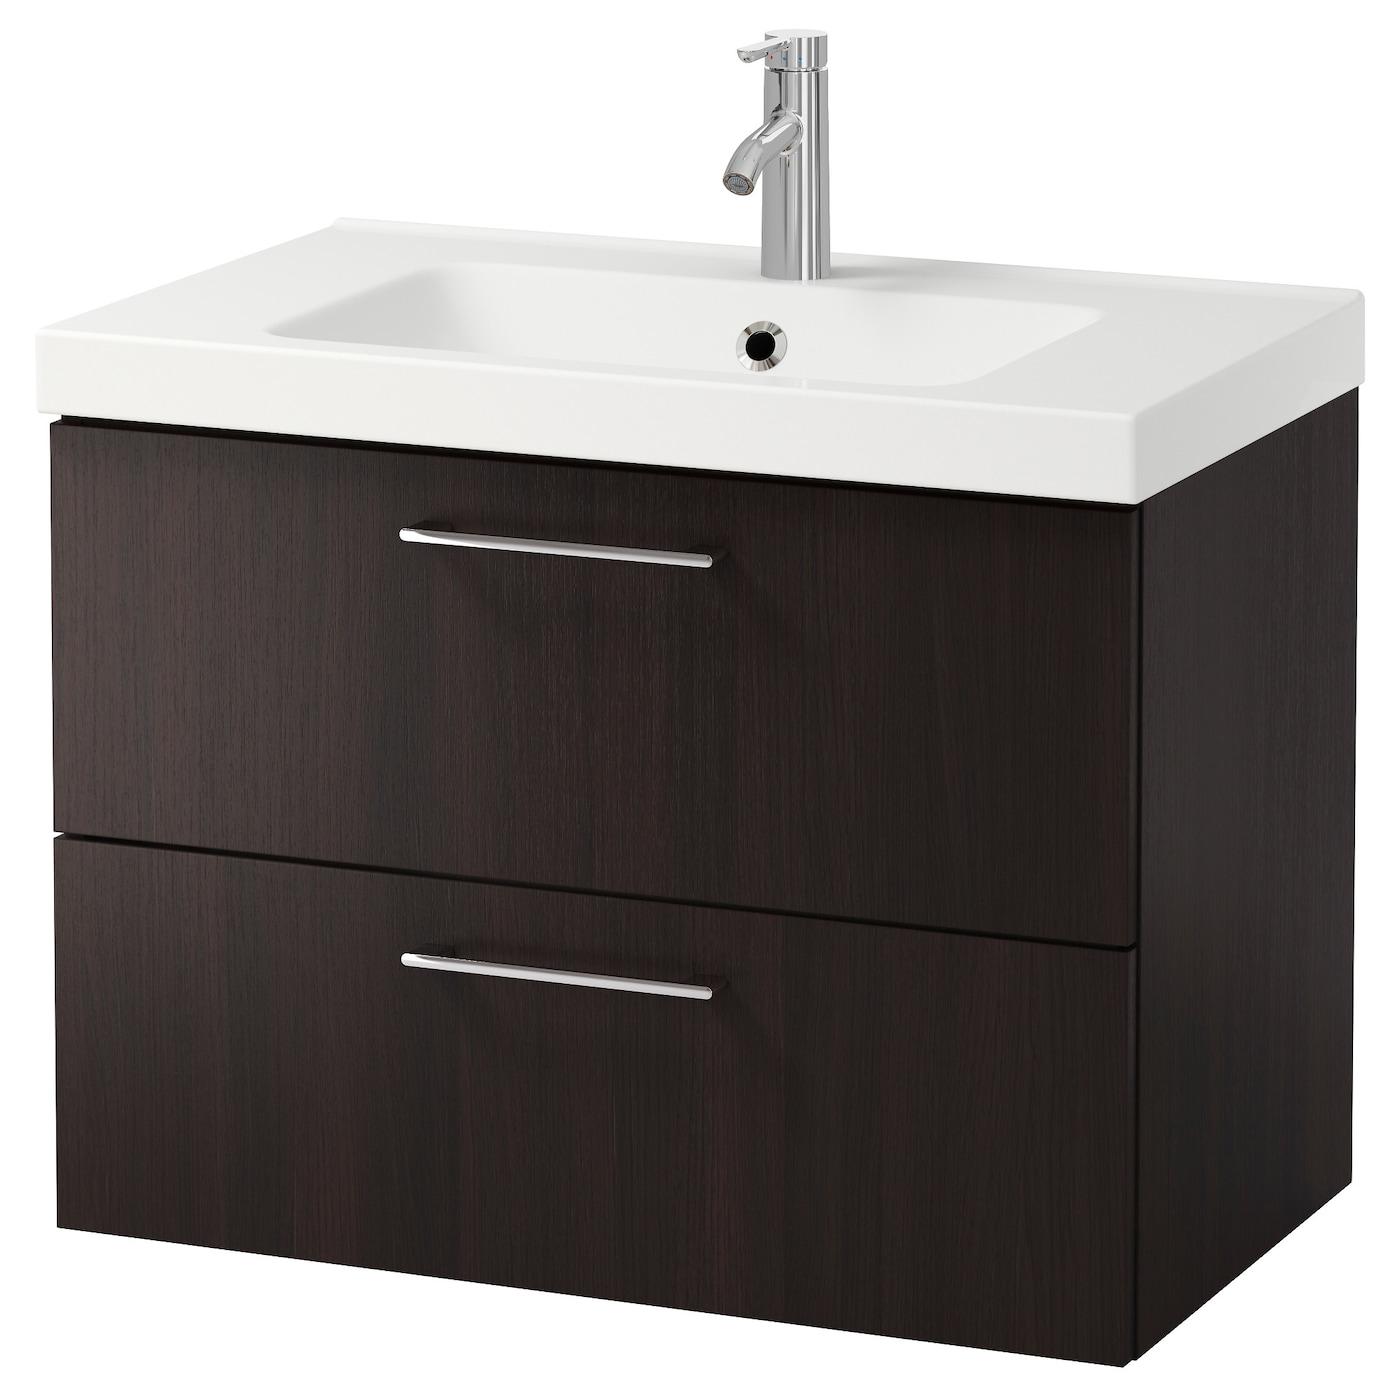 Bathroom base cabinets - Bathroom Vanity Units Sinks Taps U0026 Cabinets Ikea